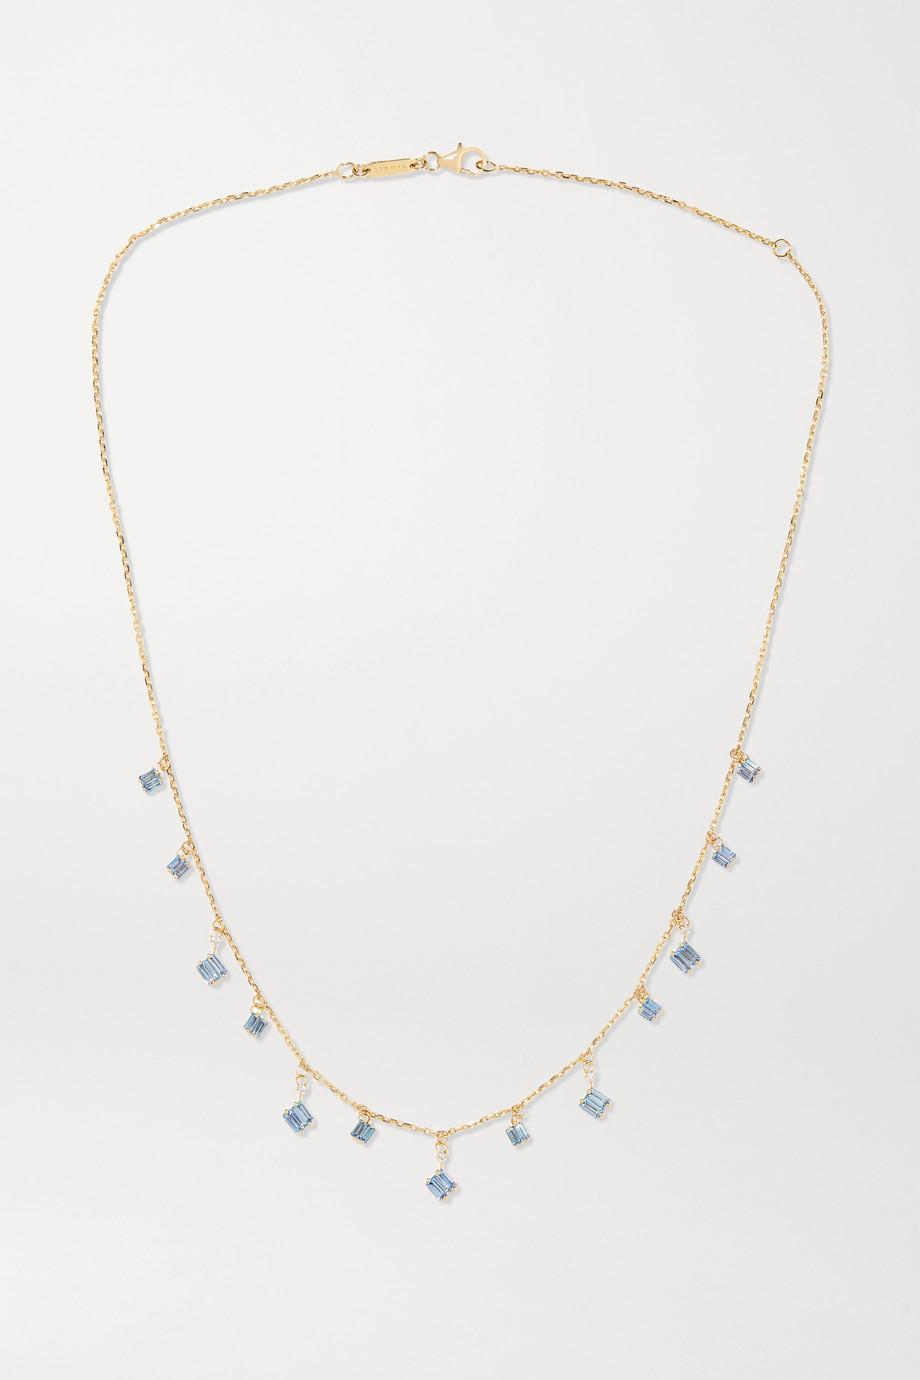 Suzanne Kalan 18-karat gold, sapphire and diamond necklace